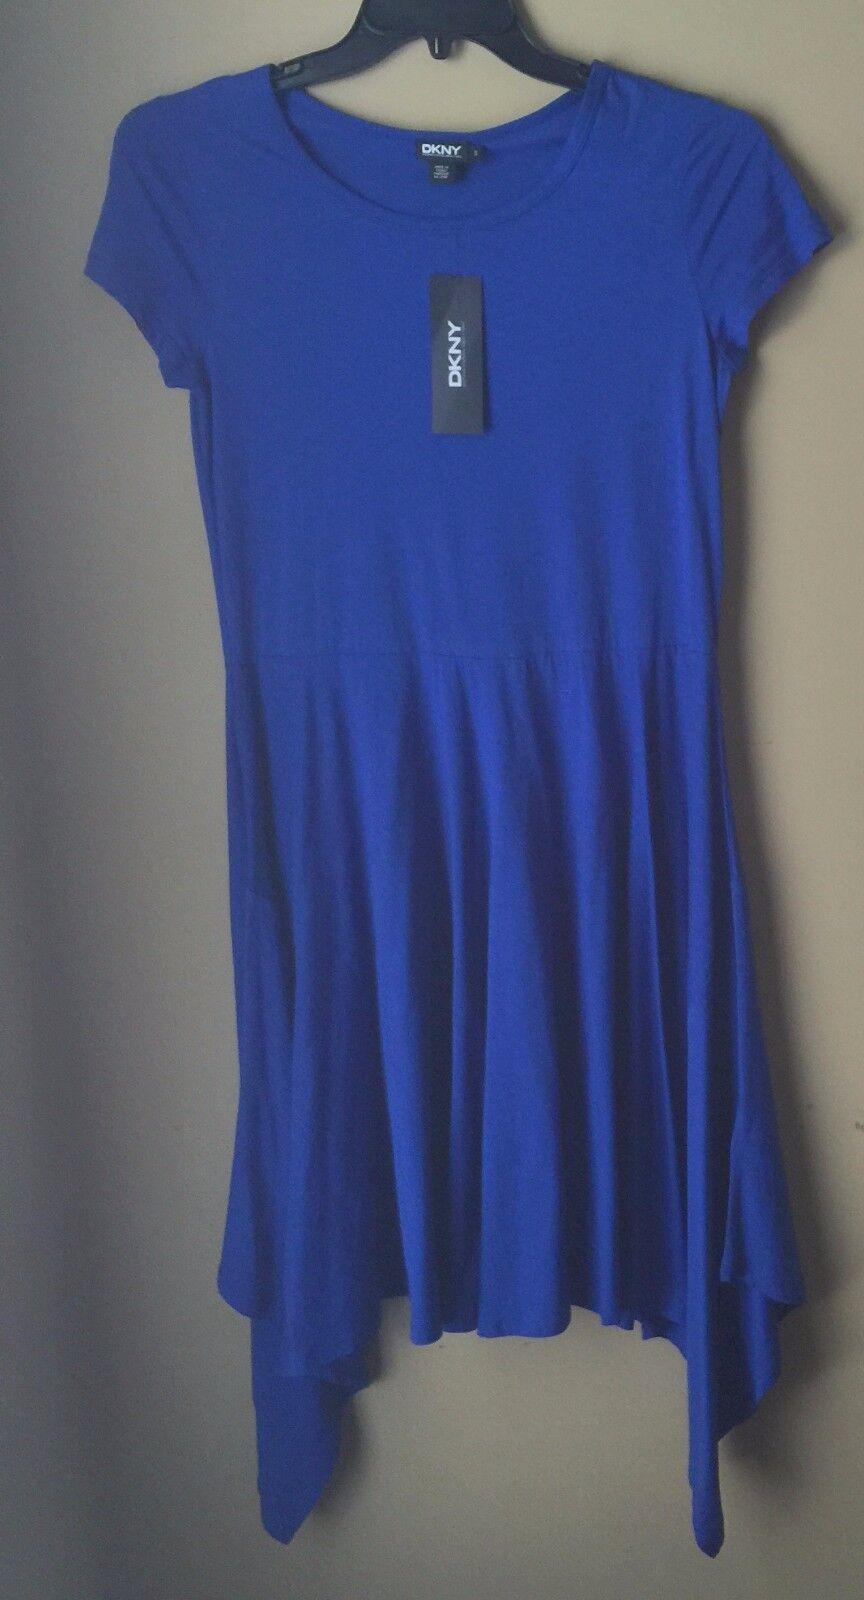 DKNY True bluee Cotton Short Sleeve Shift Asymmetric Dress S